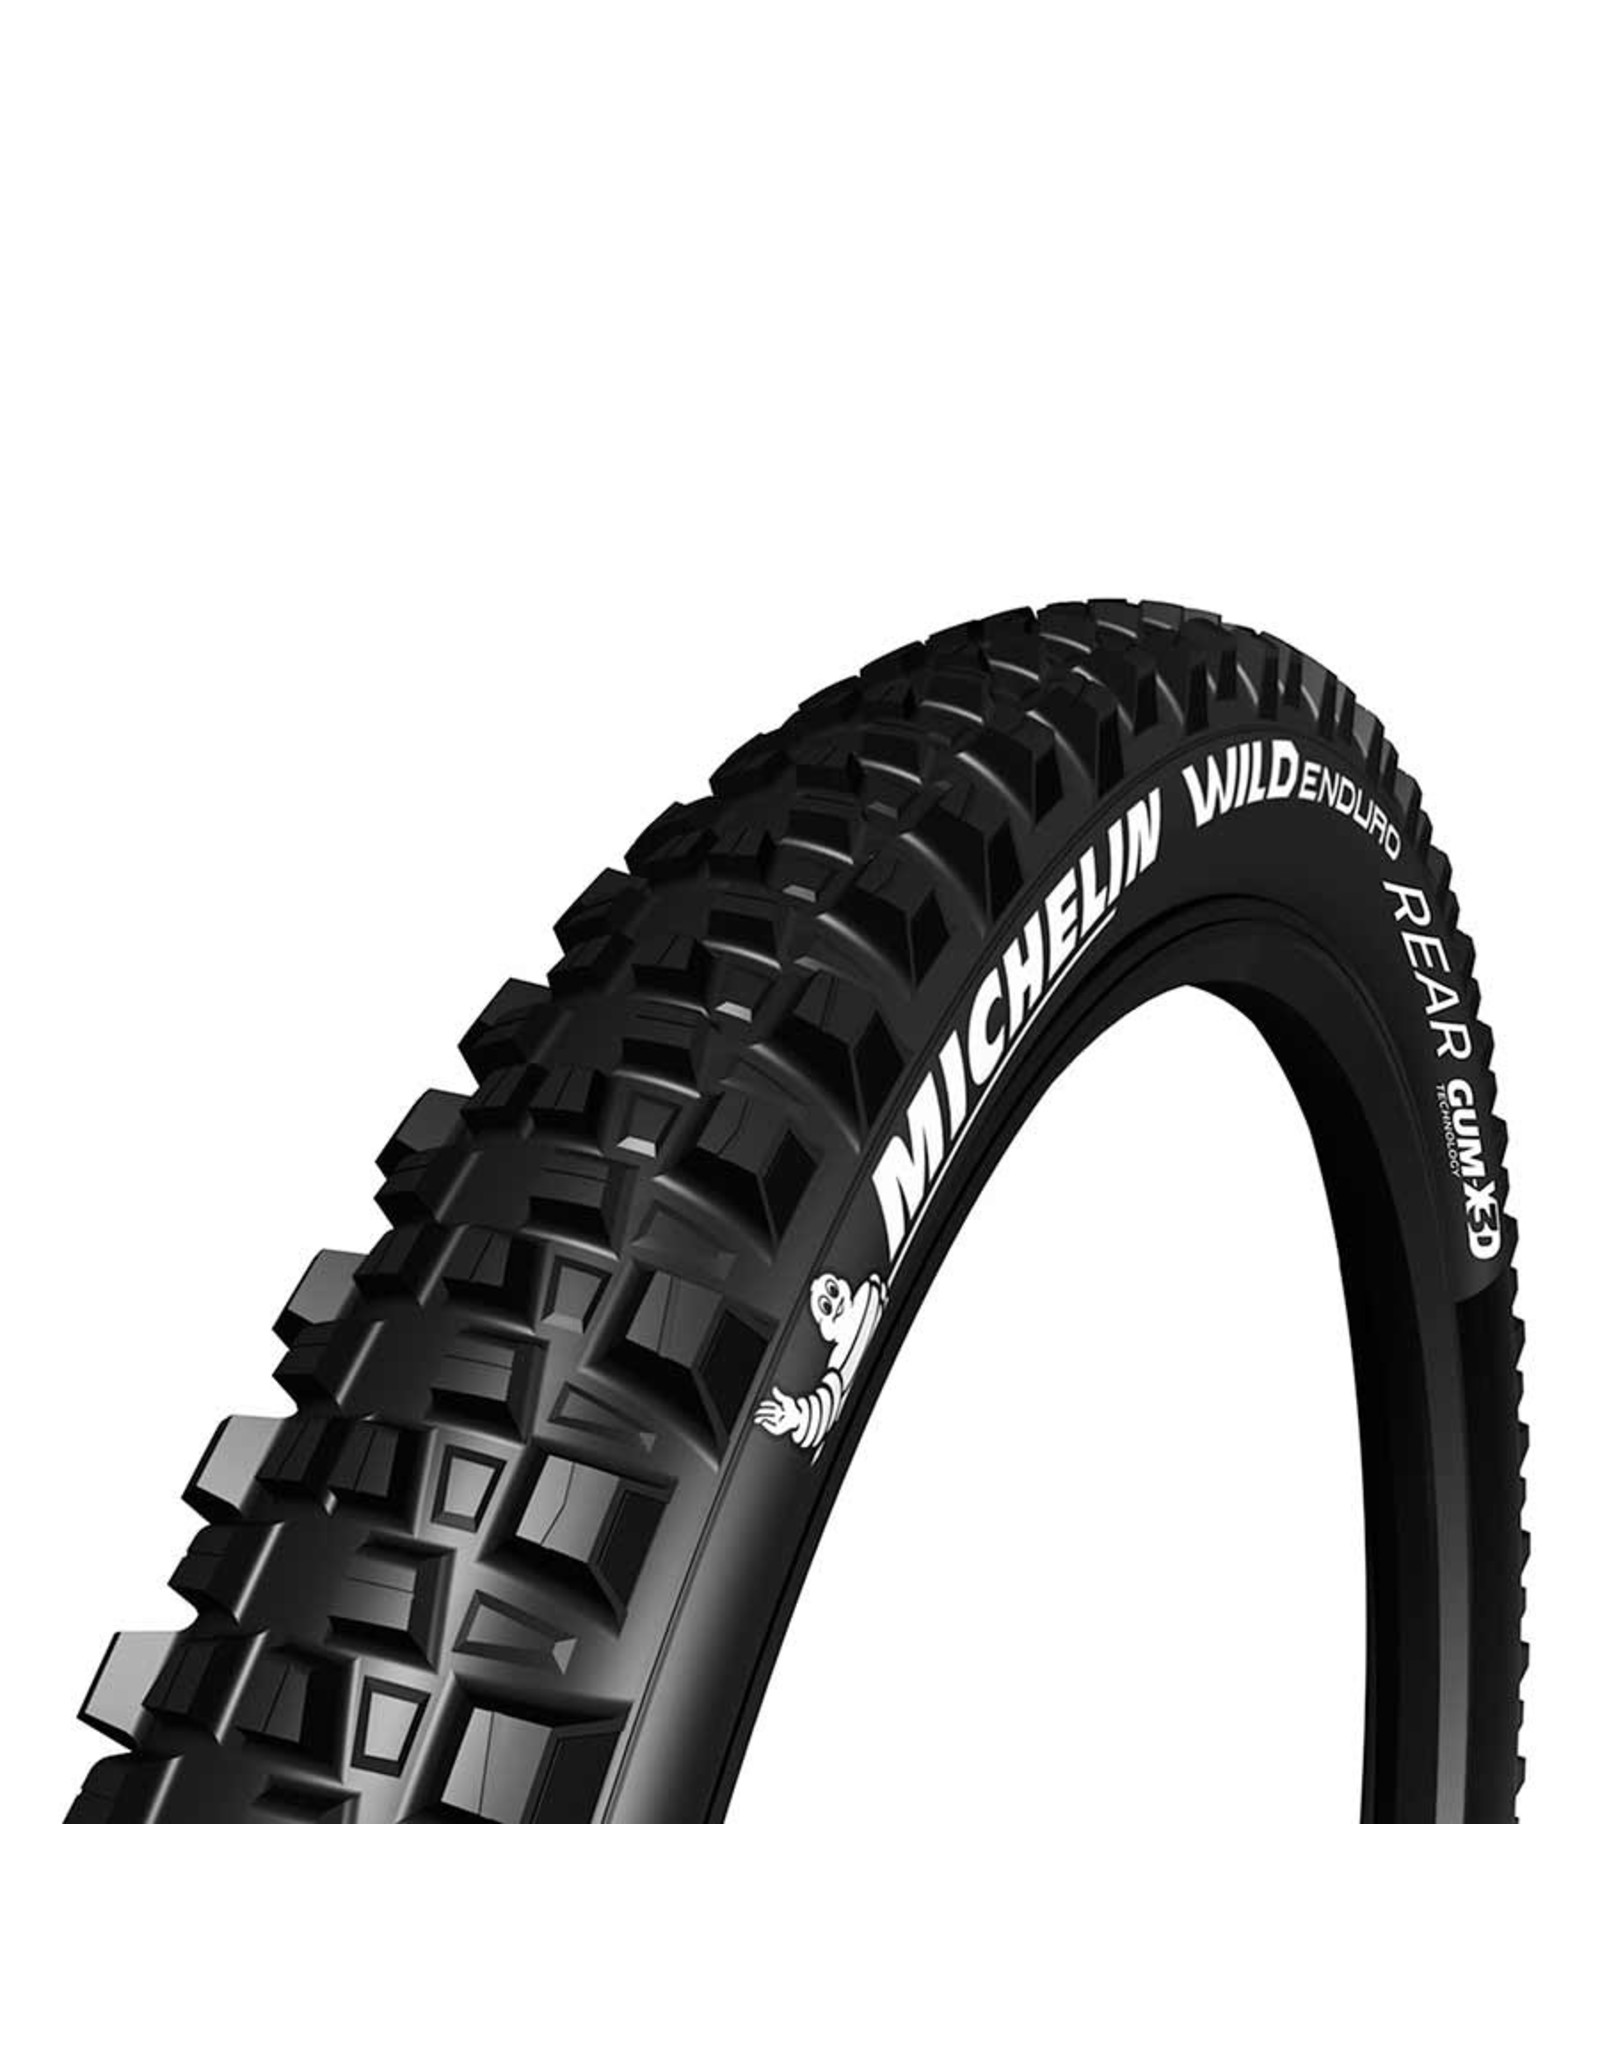 Michelin Michelin, Wild Enduro Rear, Tire, 29''x2.40, Folding, Tubeless Ready, GUM-X, GravityShield, 60TPI, Black